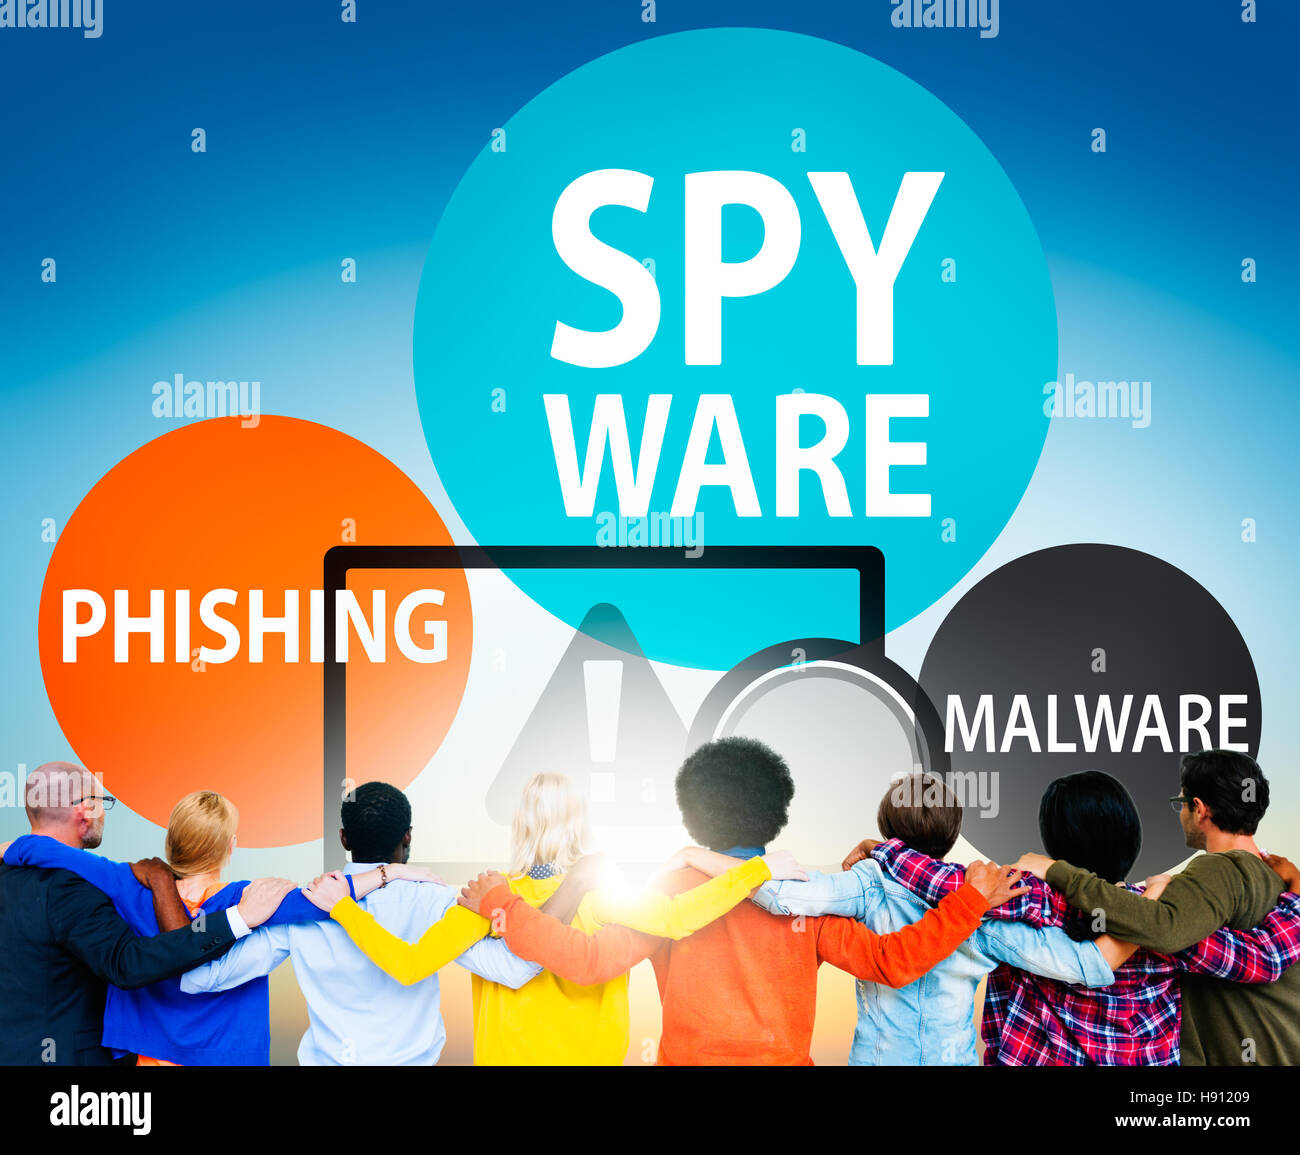 Spyware Phishing Hacking Malware Concepto Virus Imagen De Stock